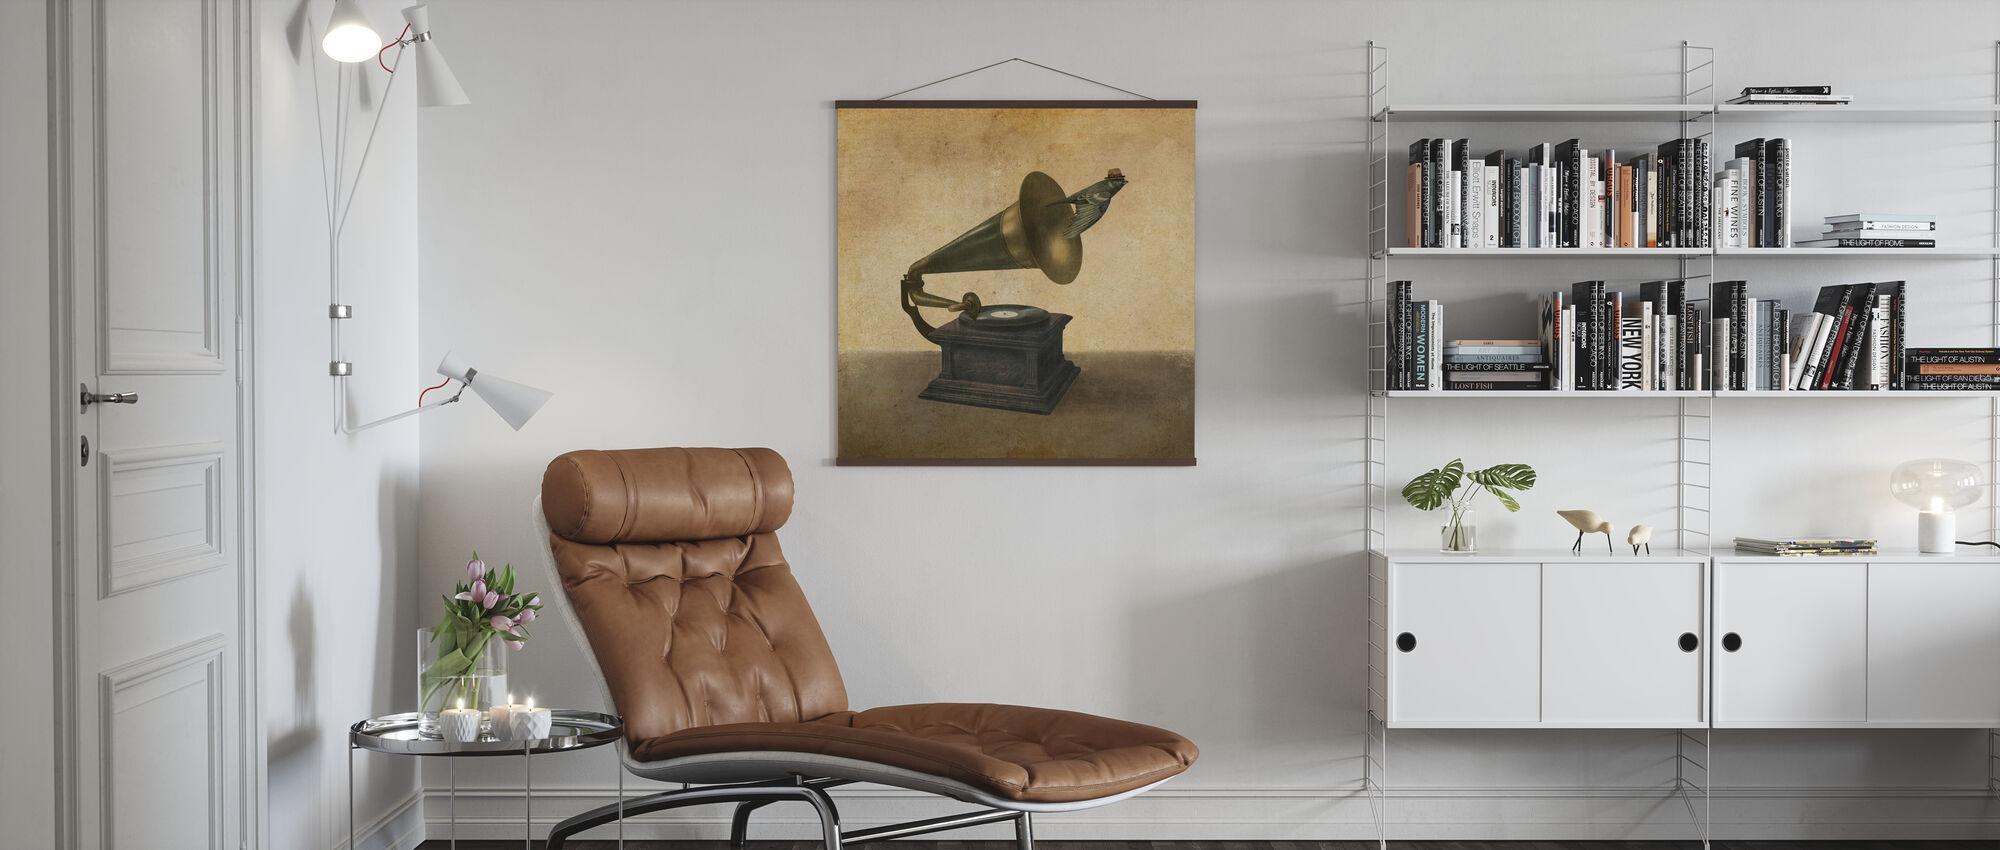 Vintage Songbird - Poster - Living Room